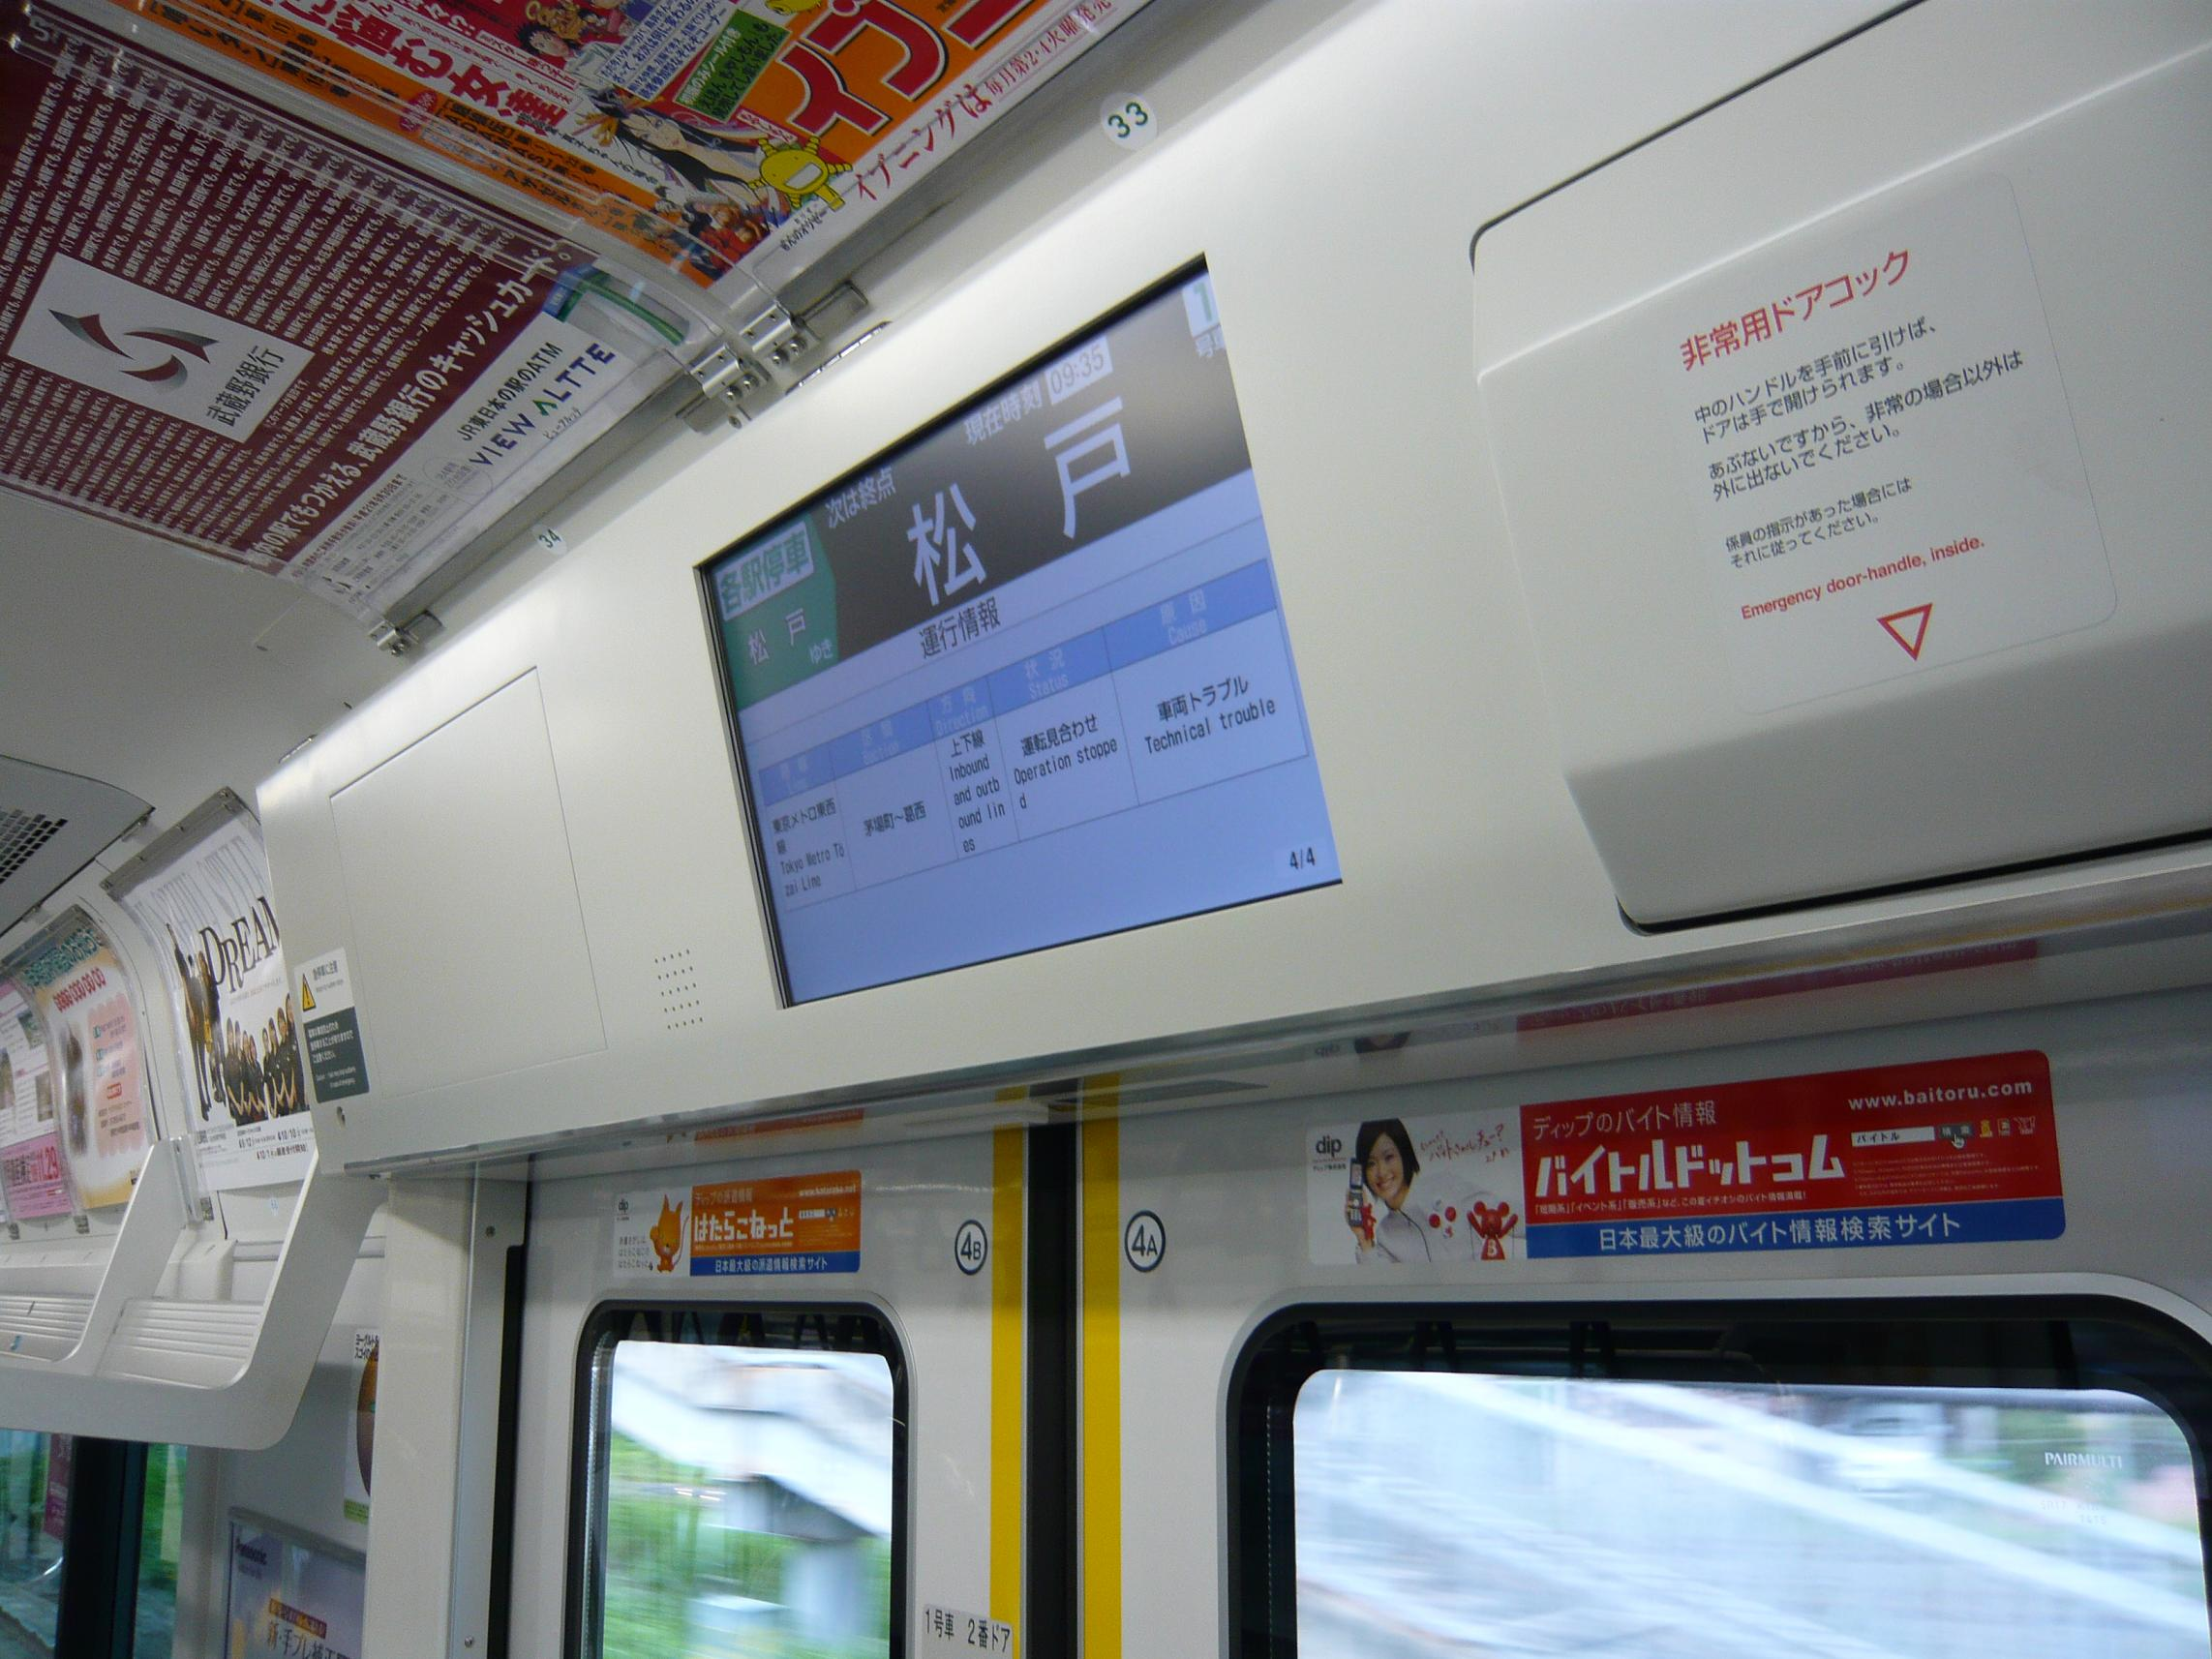 P1010701-2.JPG